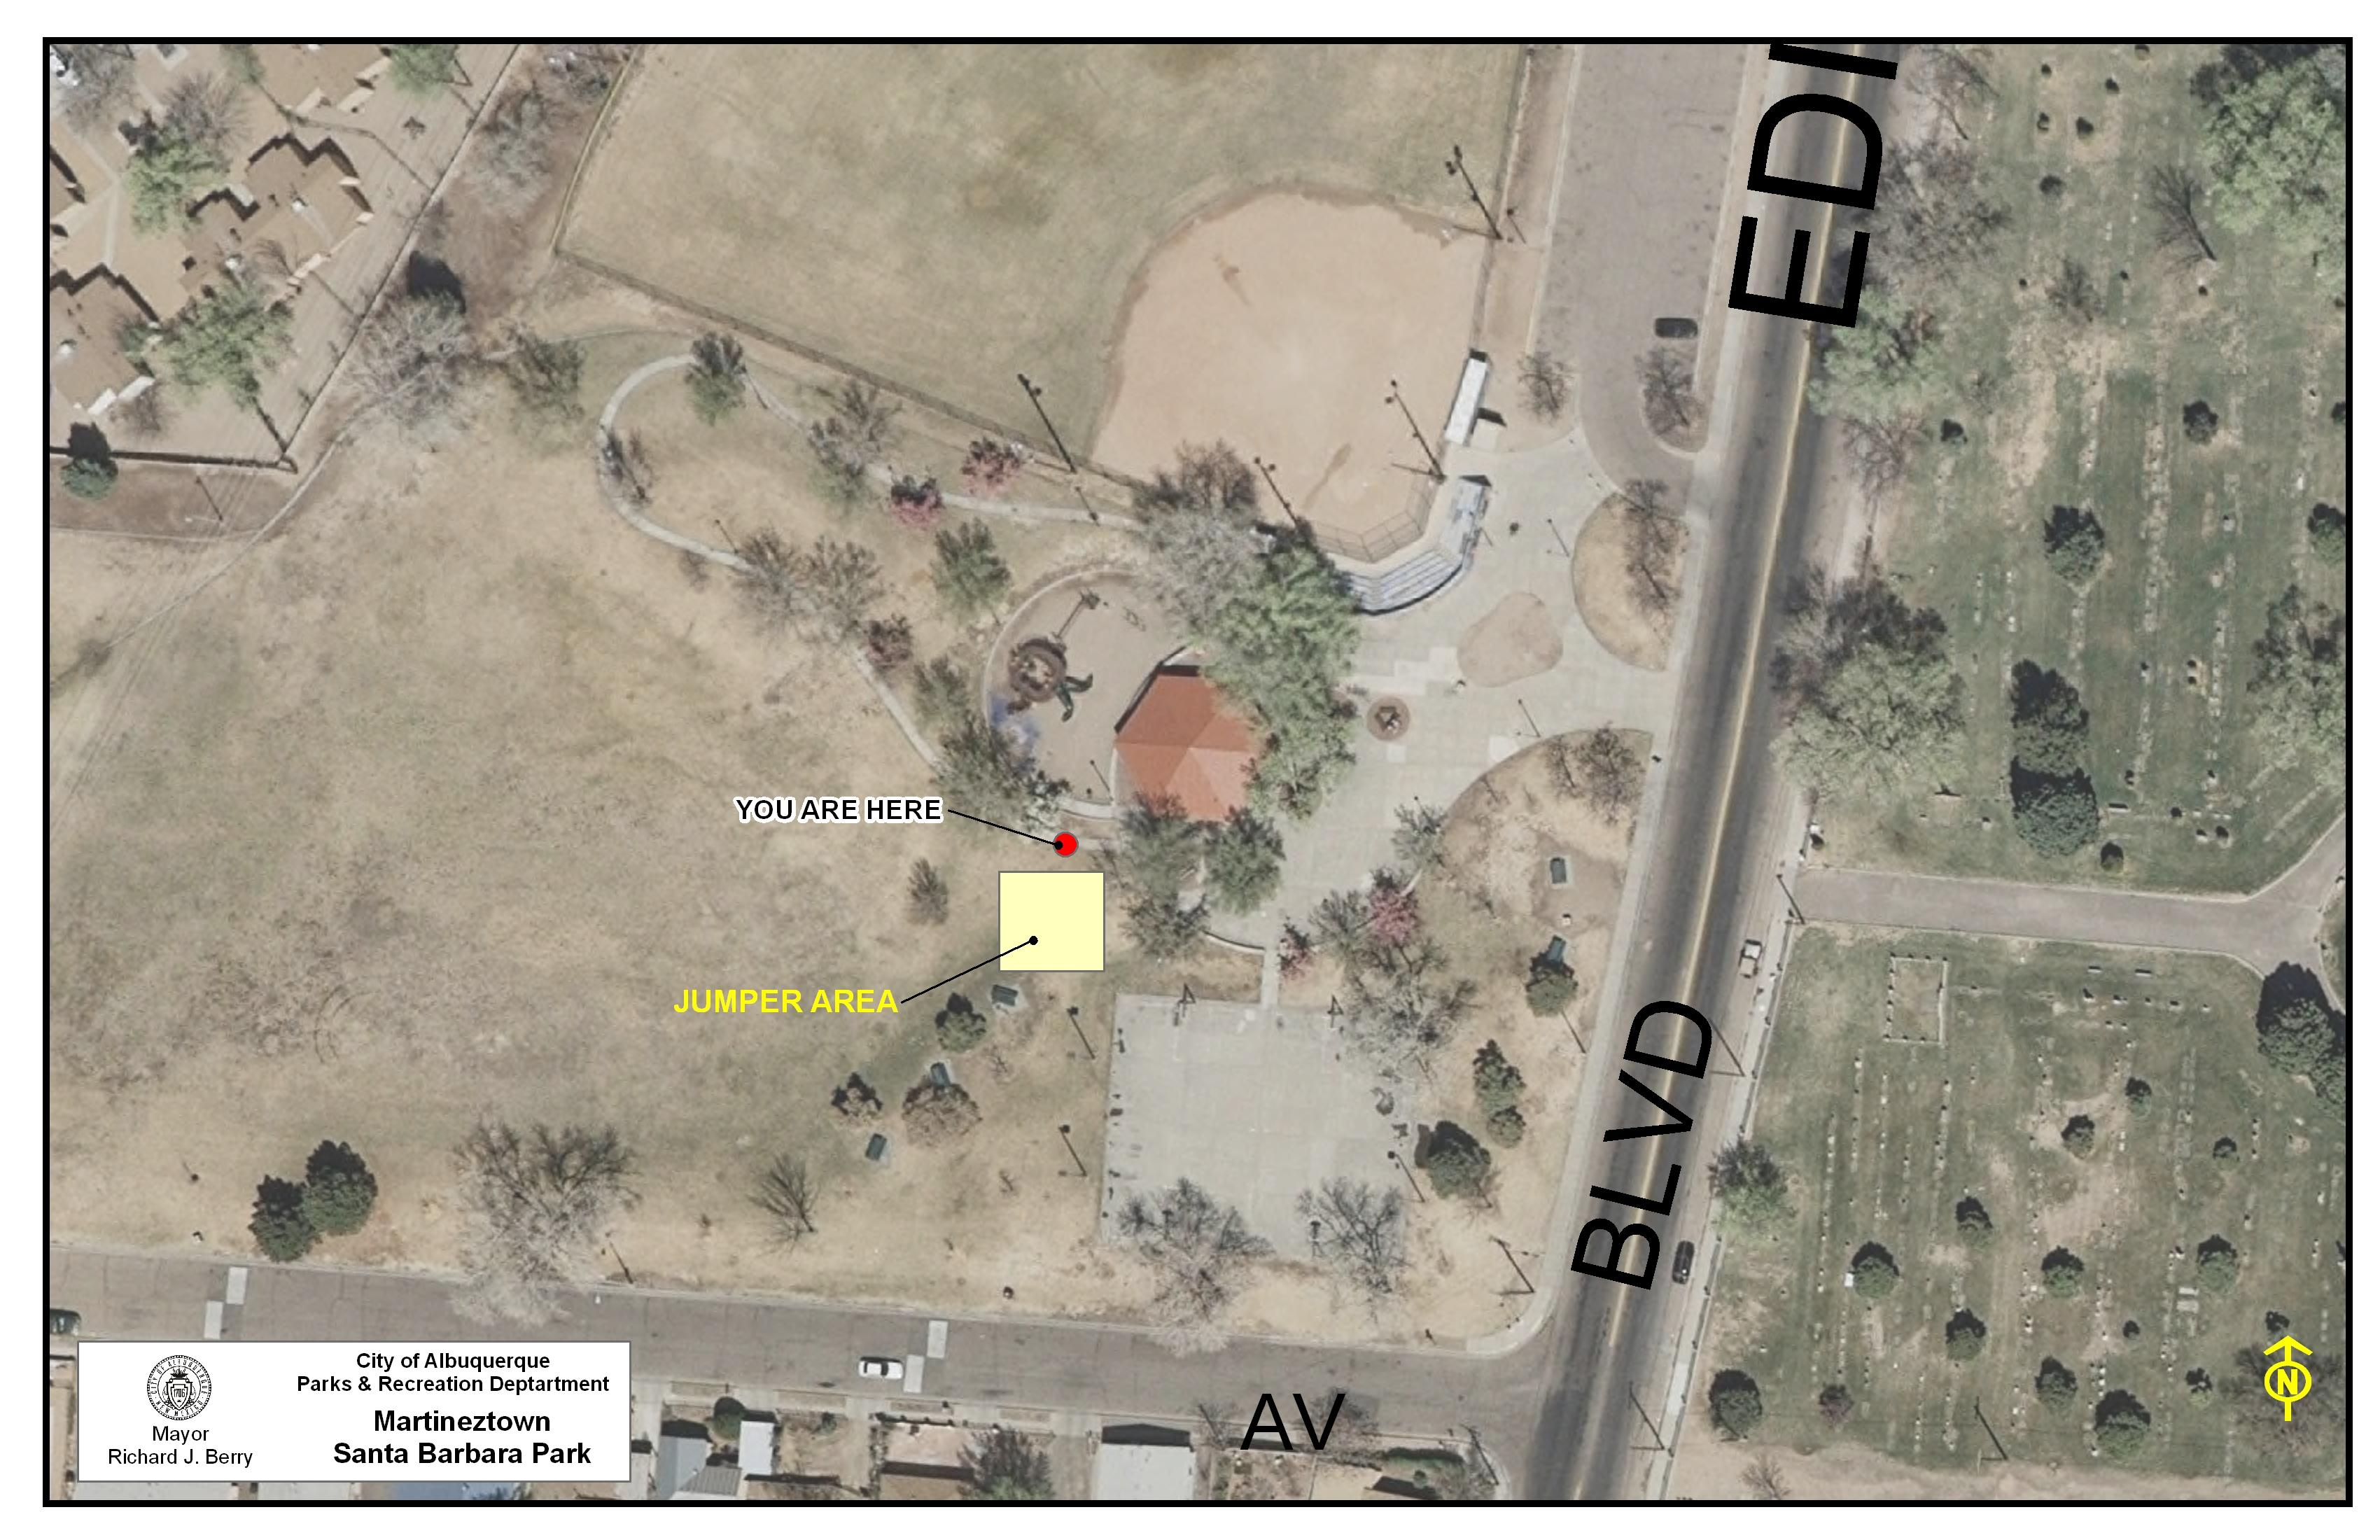 Martineztown - Santa Barbara Park Jumper Map